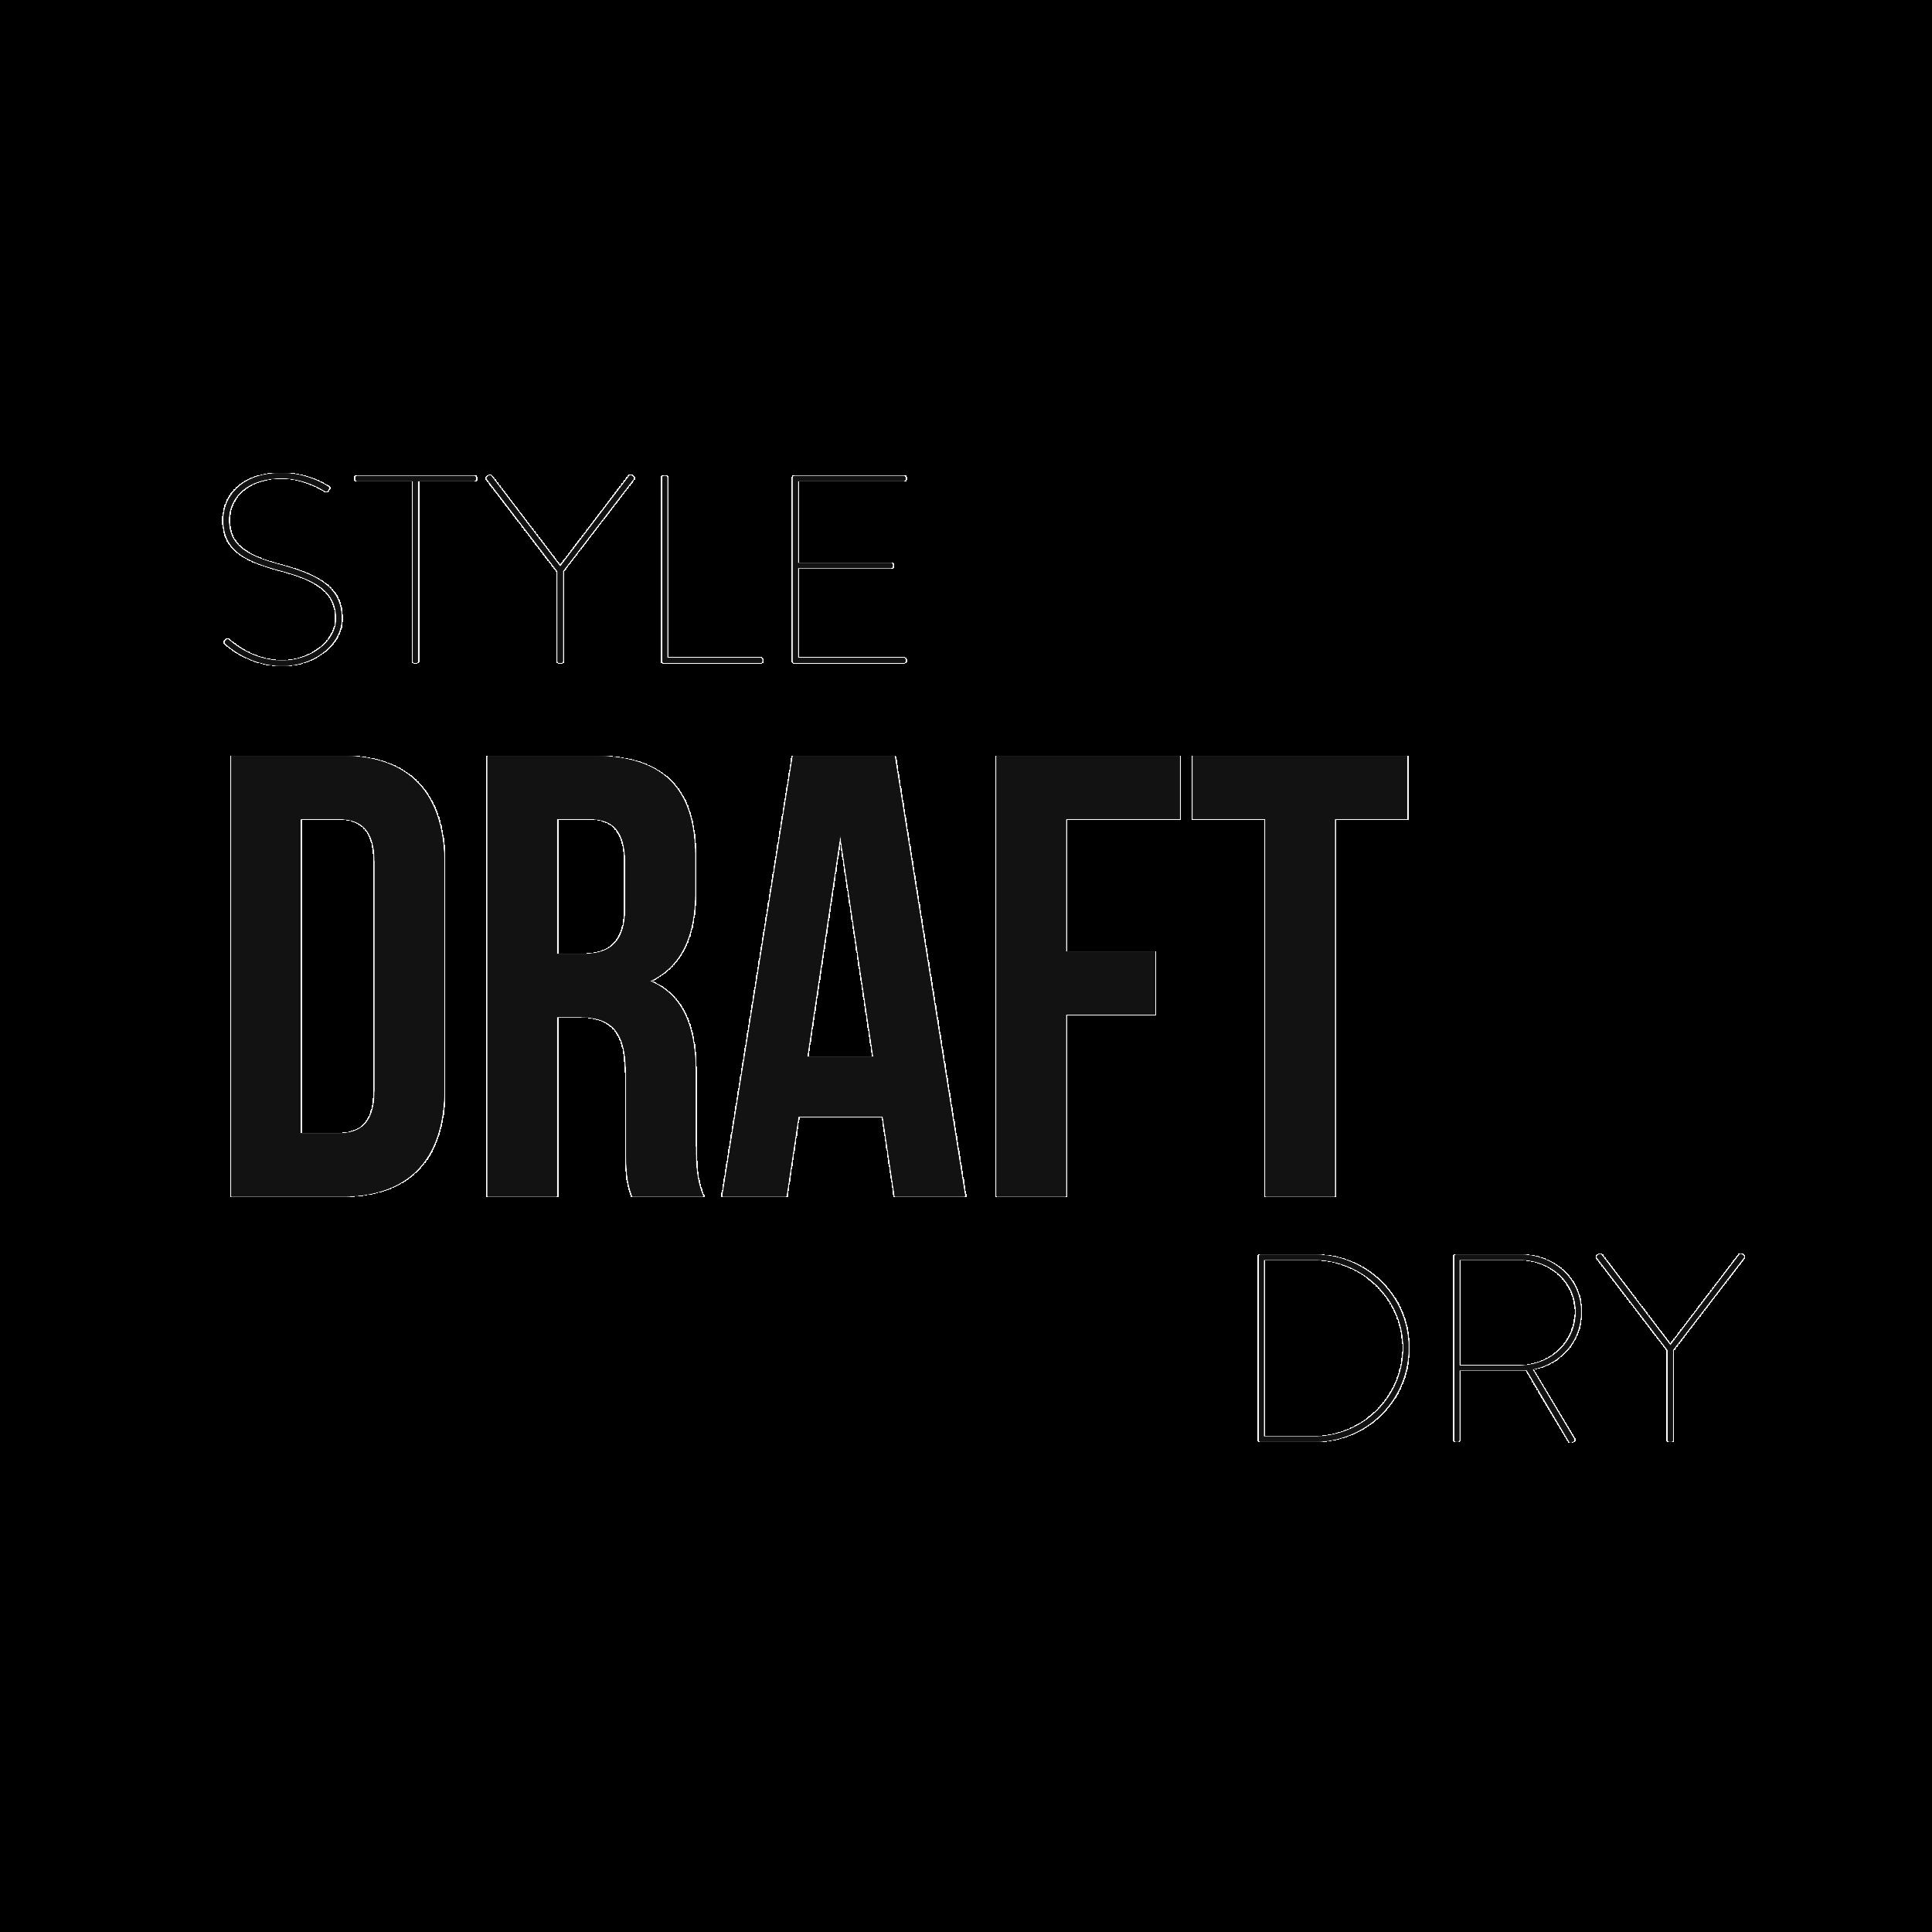 draftstat_transparent__DRAFT DRY.png